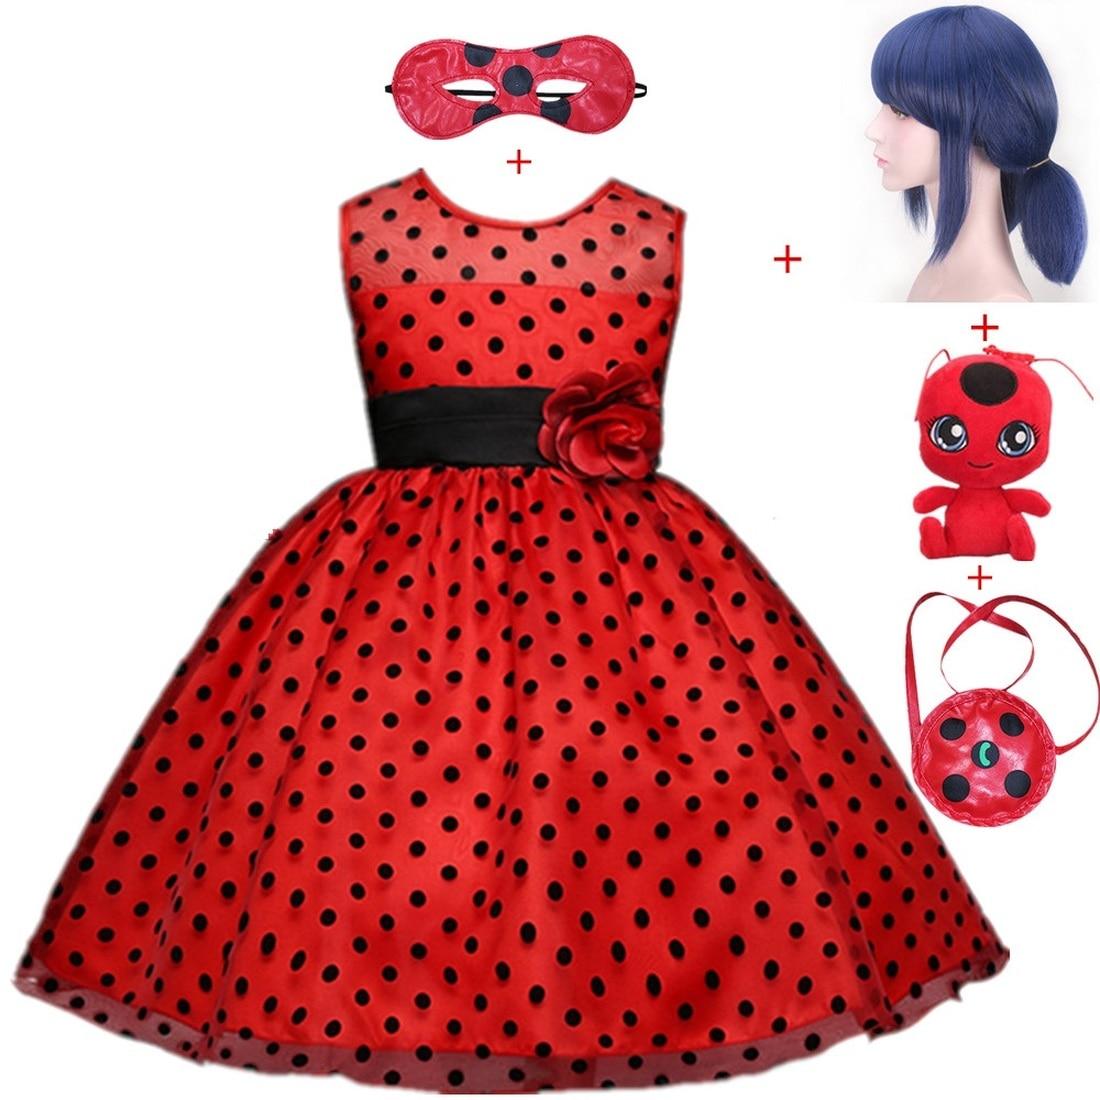 Carnival Ladybug Halloween Cosplay Costume Princess Flower Girl Dress Summer Tutu Wedding Birthday Party Lady Bug Kids Dresses